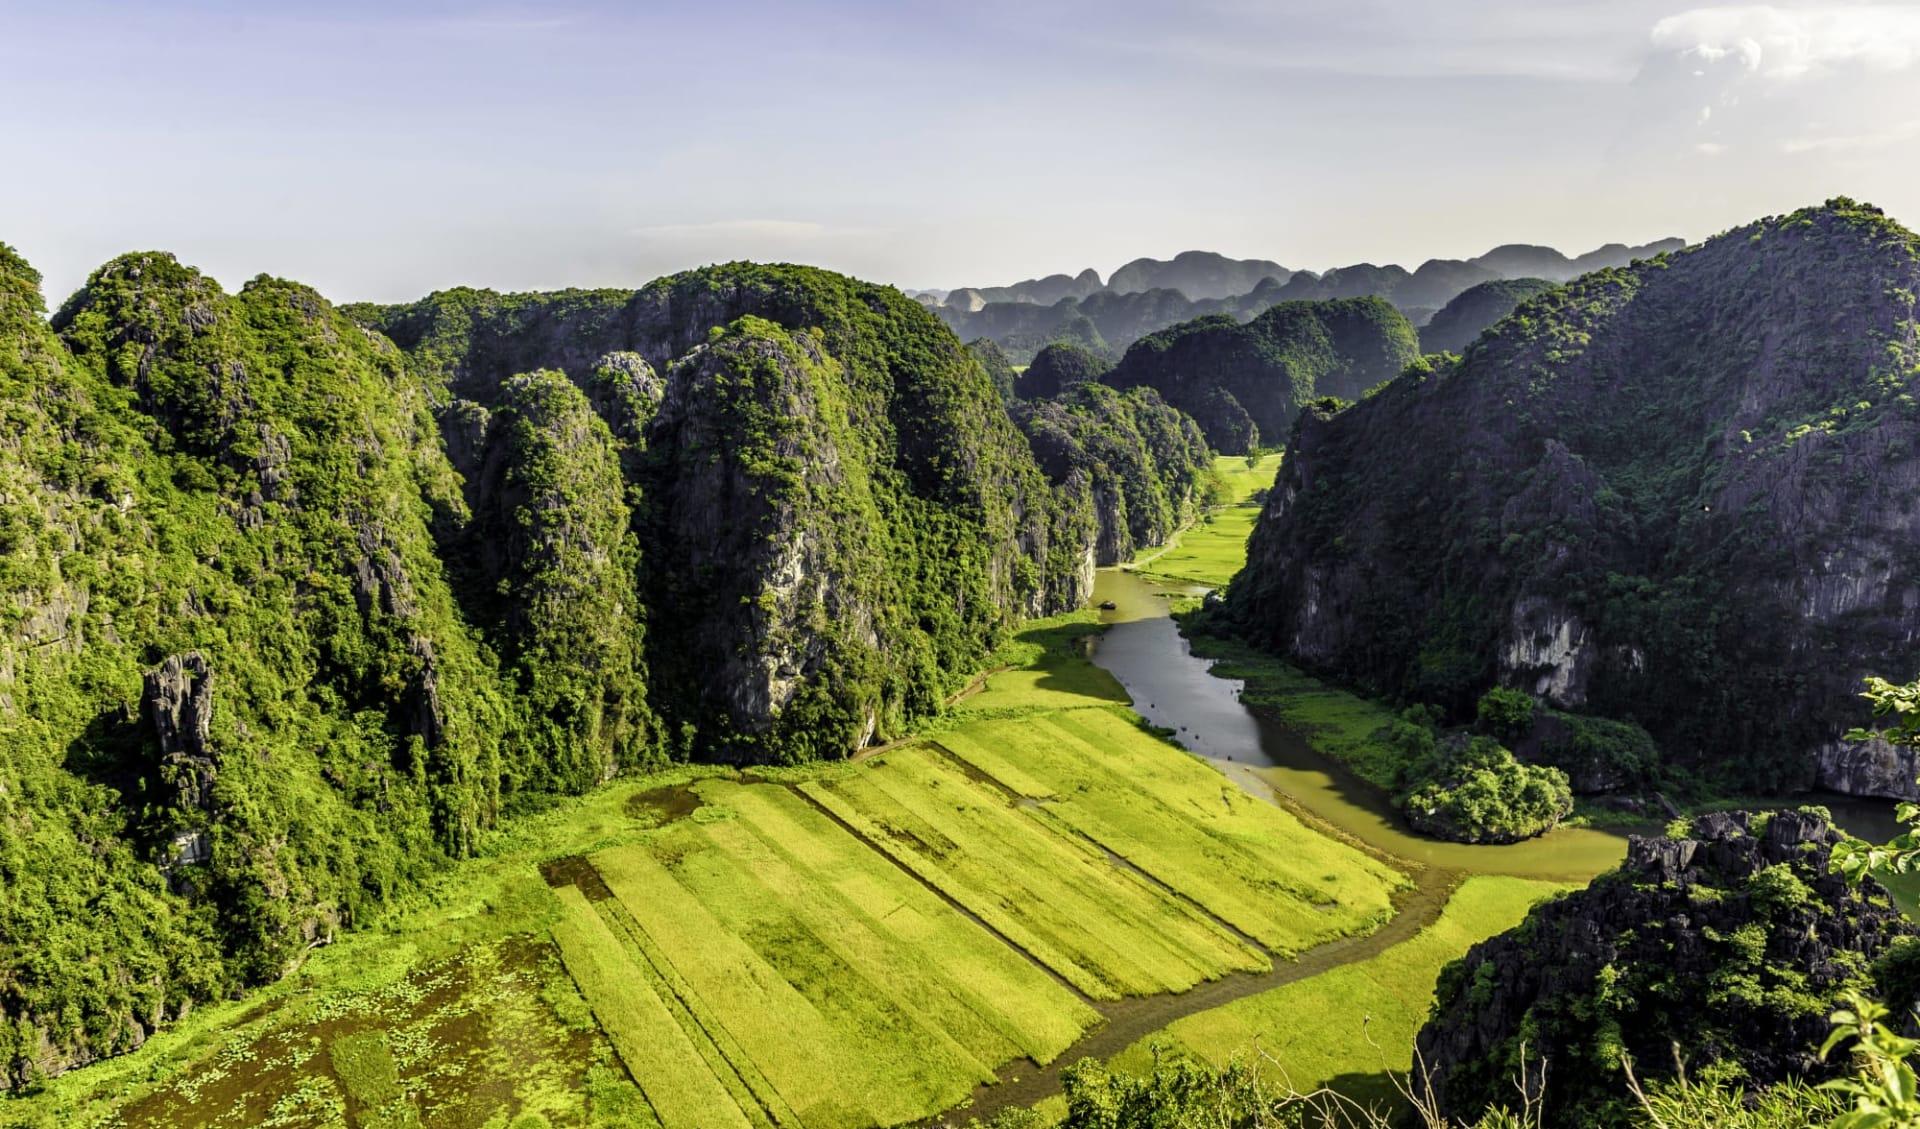 Impressionen Nordvietnams & Halong Bay Kreuzfahrt ab Hanoi: Tam Coc Bich Dong